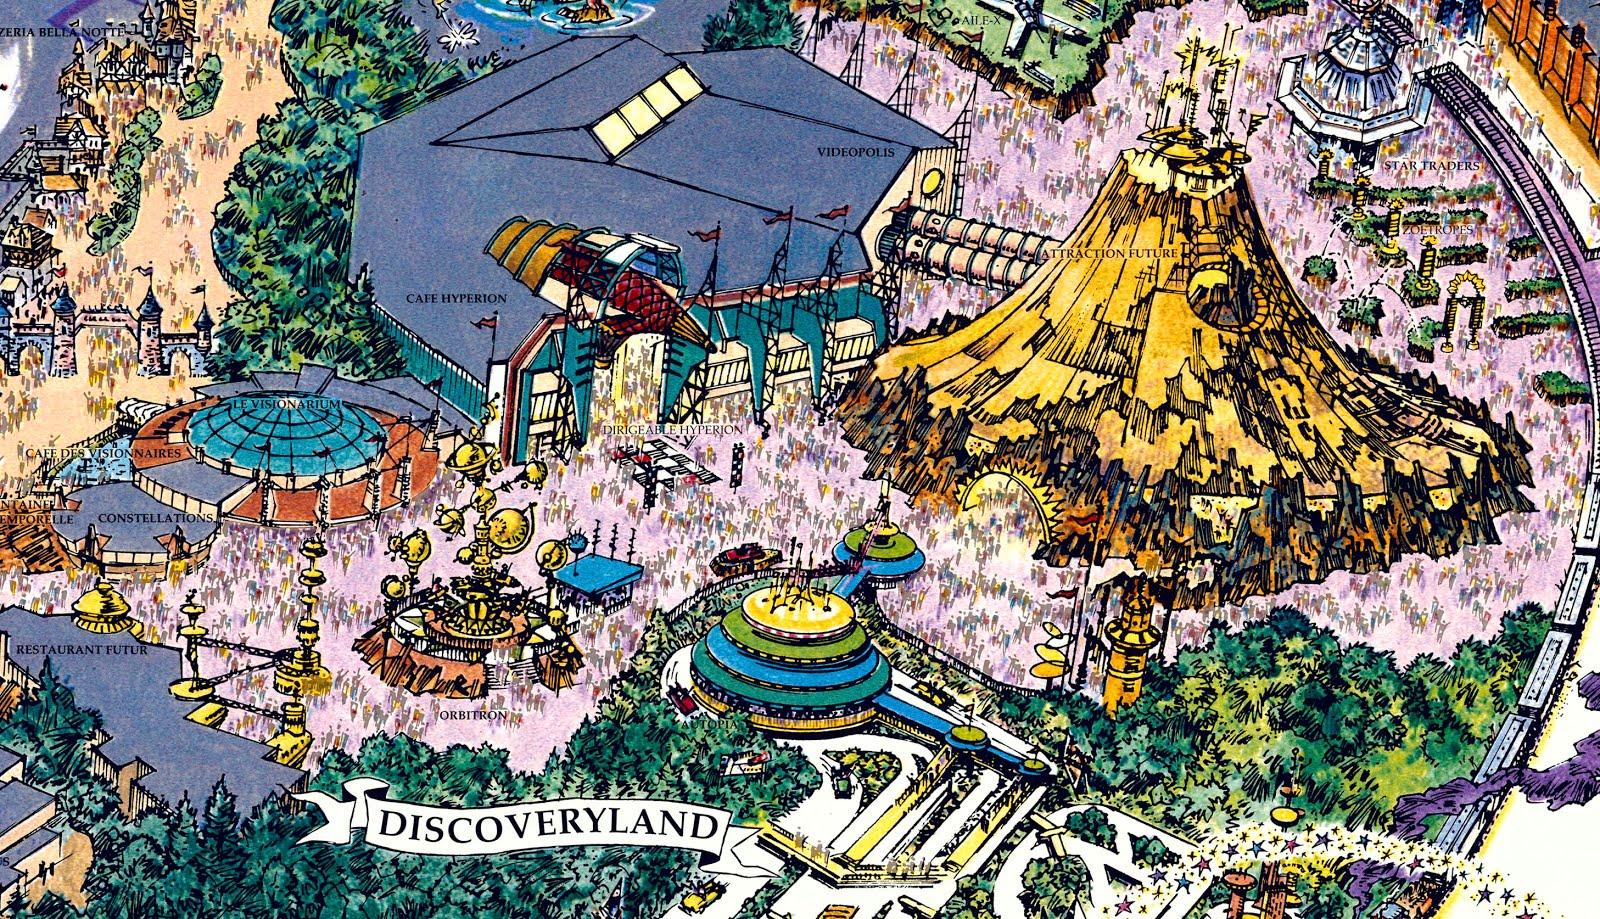 Disneyland Paris Map 2016 Pdf.Original 1992 Disneyland Paris Fun Map In Hyper Resolution